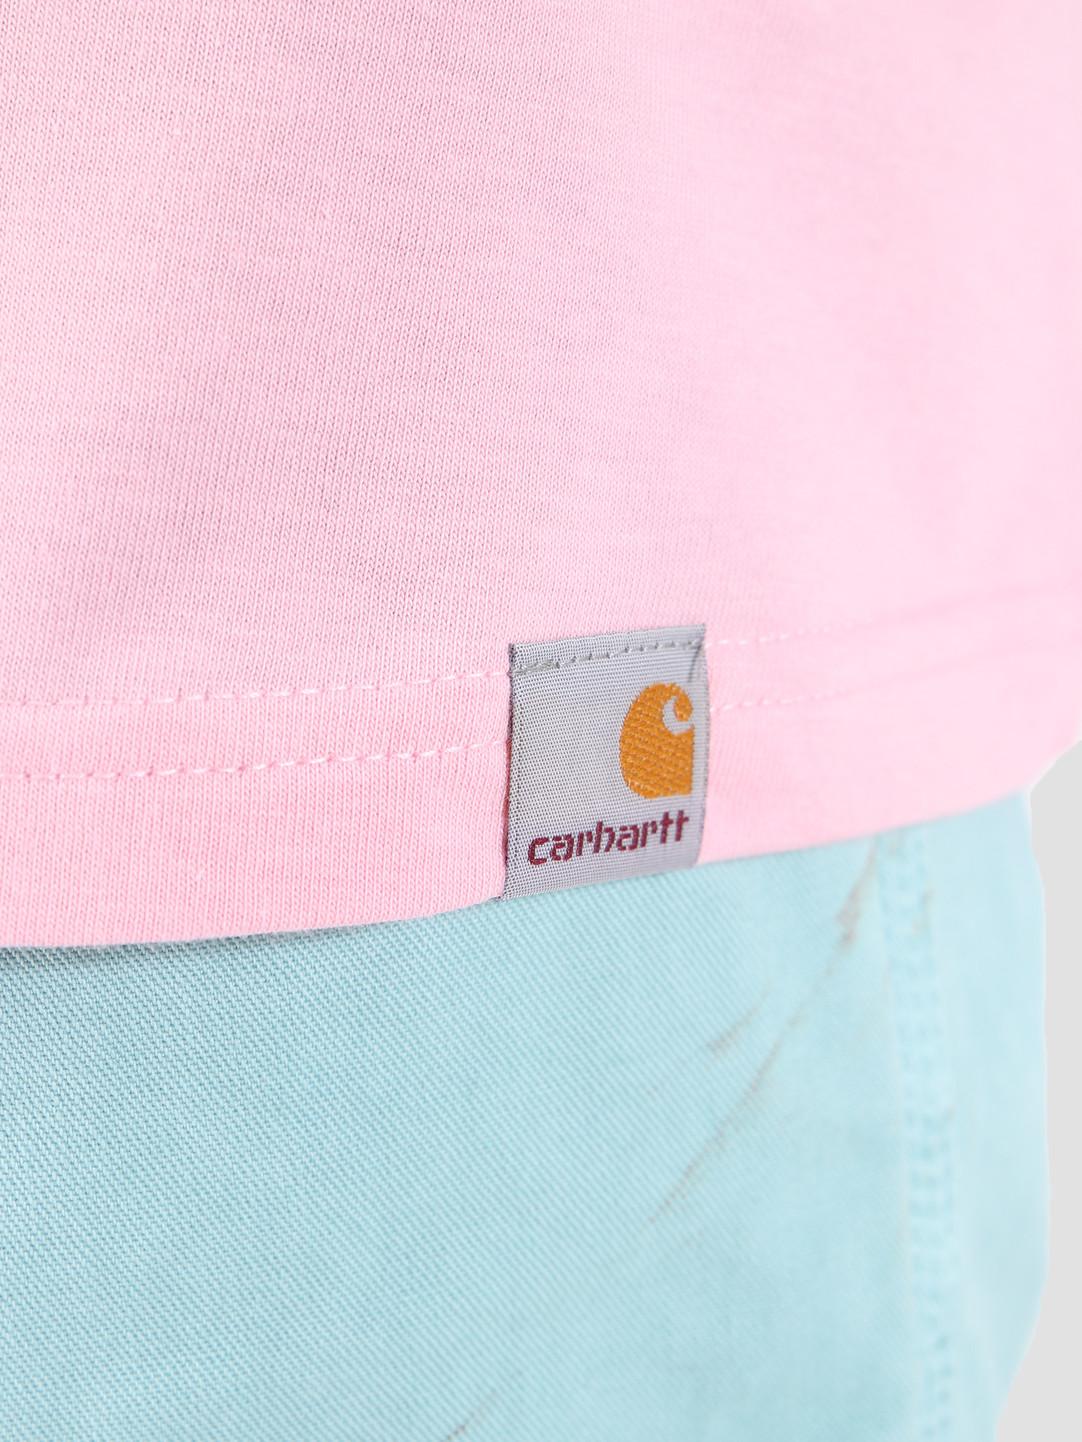 Carhartt WIP Carhartt WIP Short Sleeve Burning Palm T-Shirt Cadillac 61091000